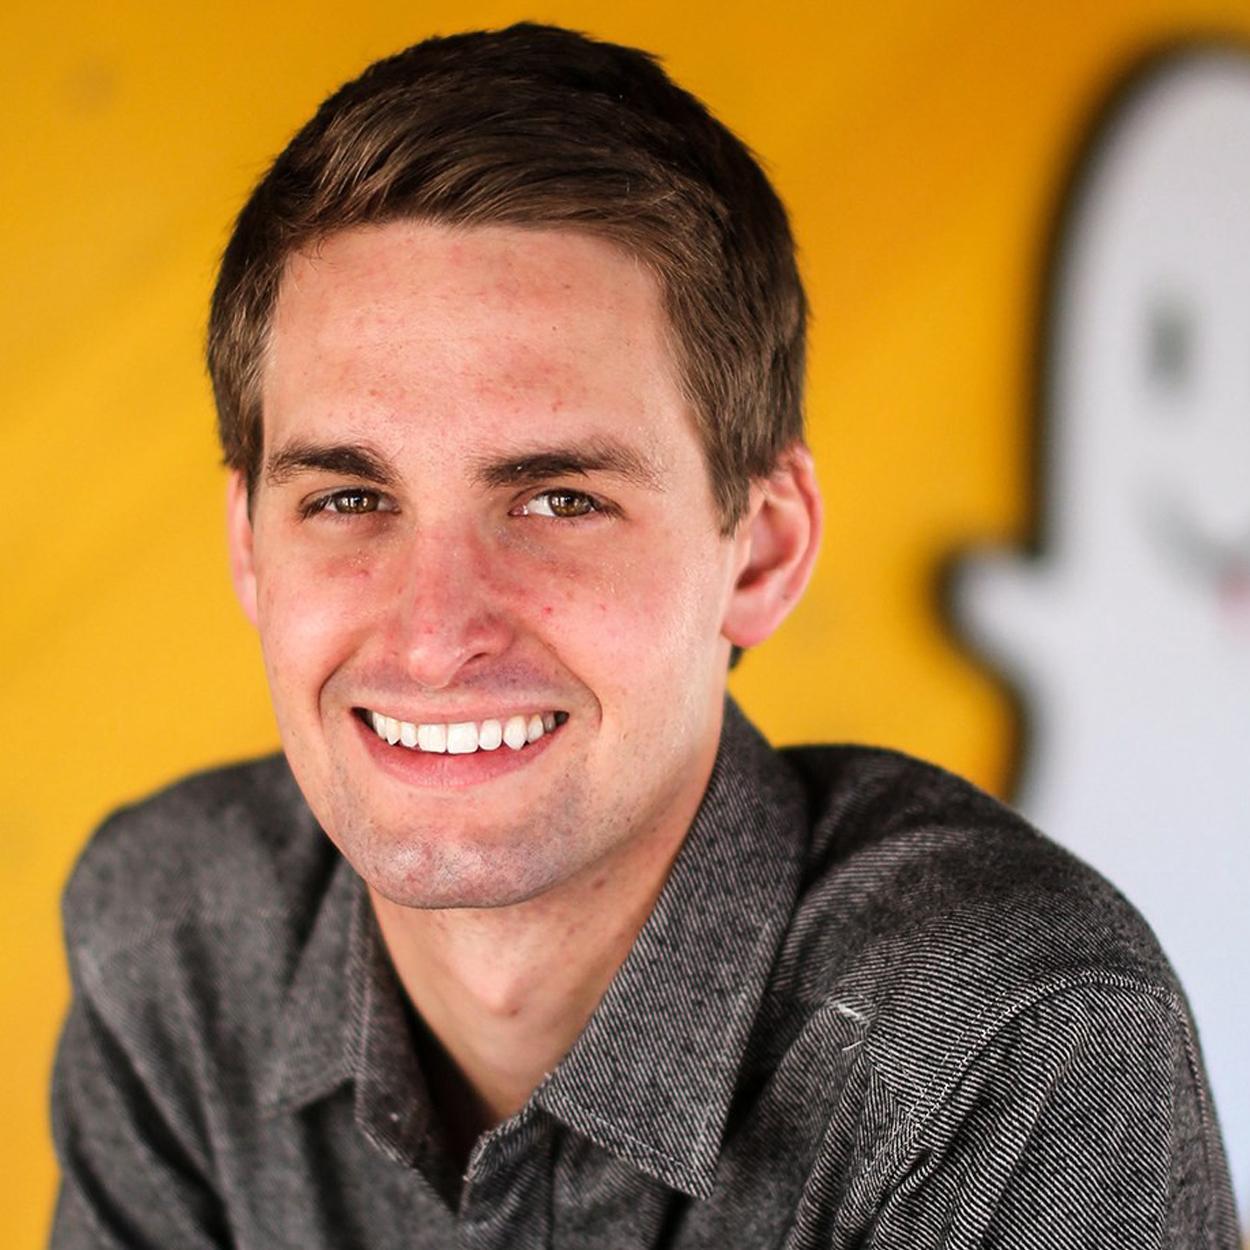 Evan Spiegel do Snapchat